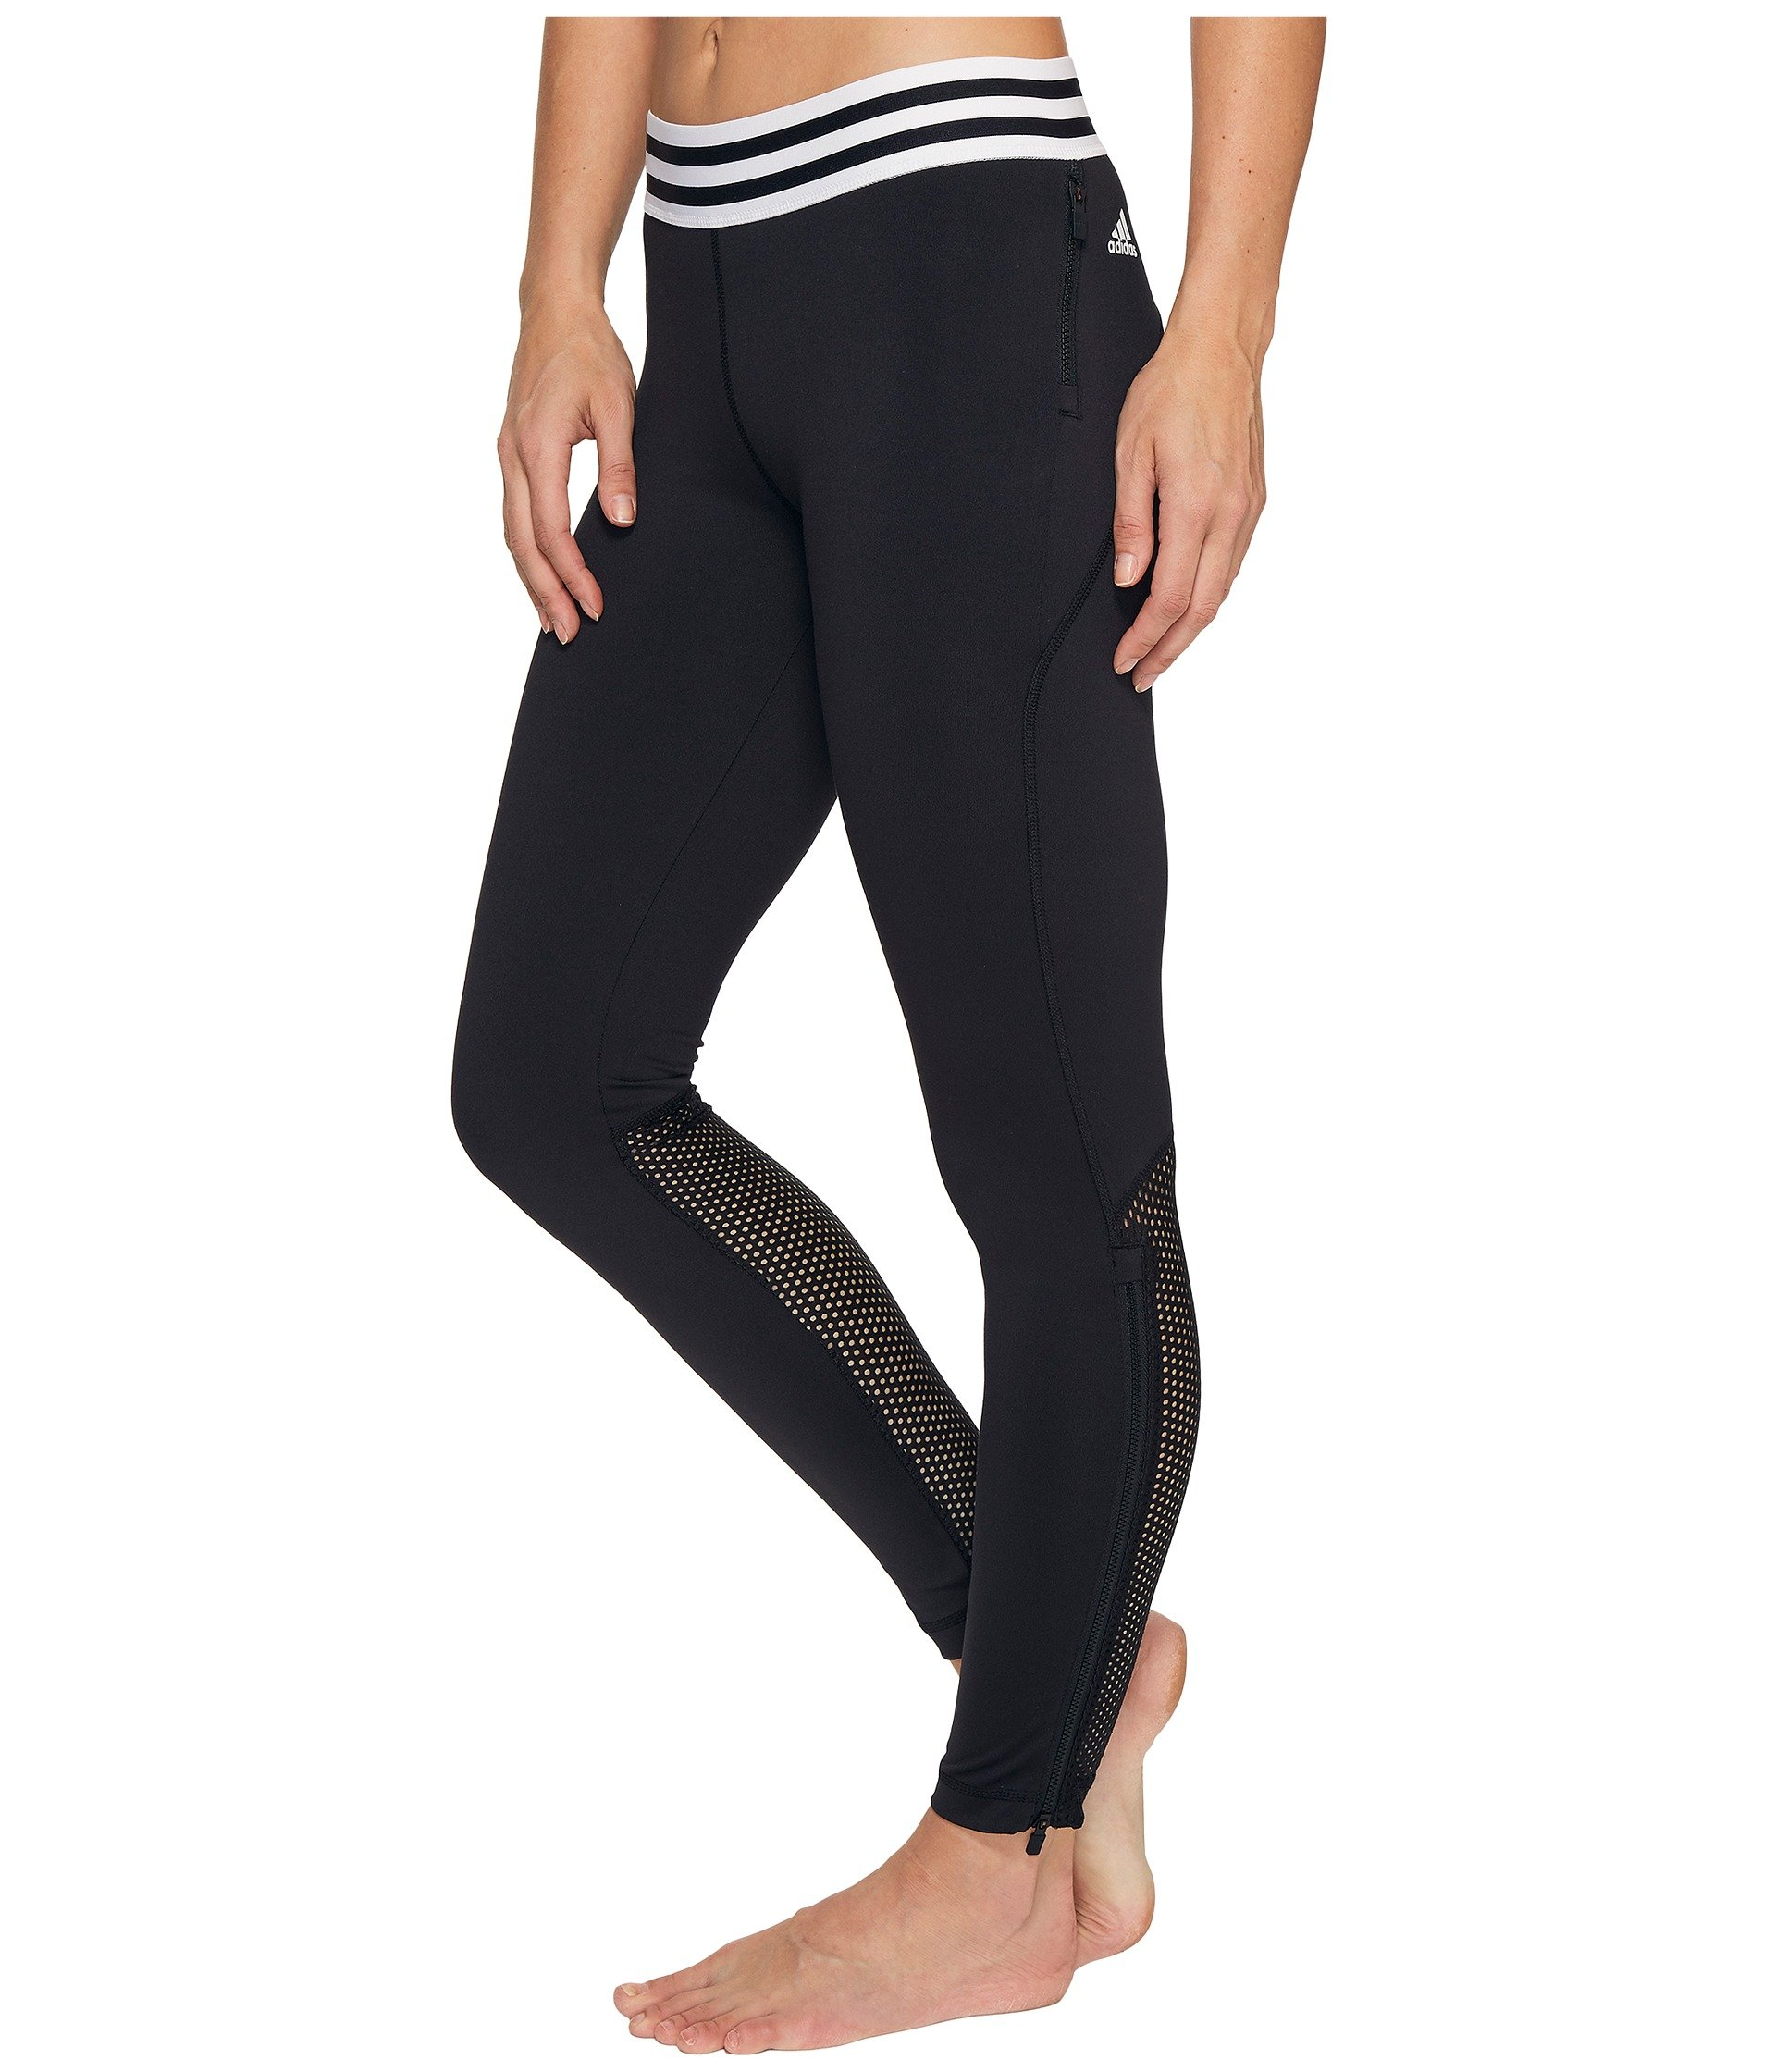 adidas sport id zipper leggings at 6pm. Black Bedroom Furniture Sets. Home Design Ideas